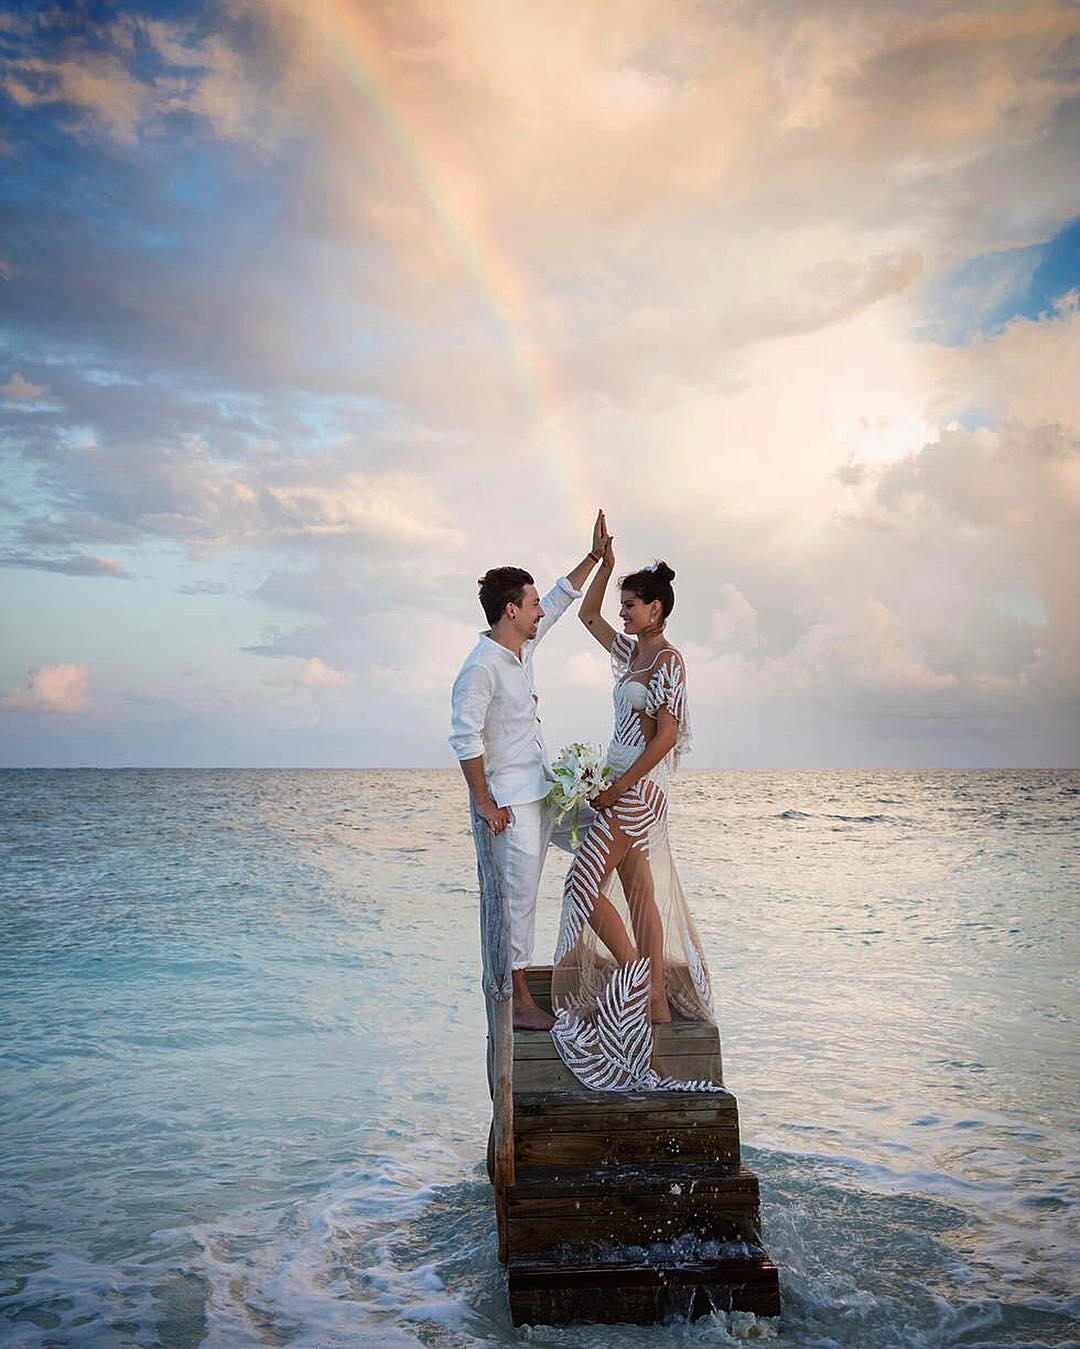 isabelli fontana - casamento - instagram (1)